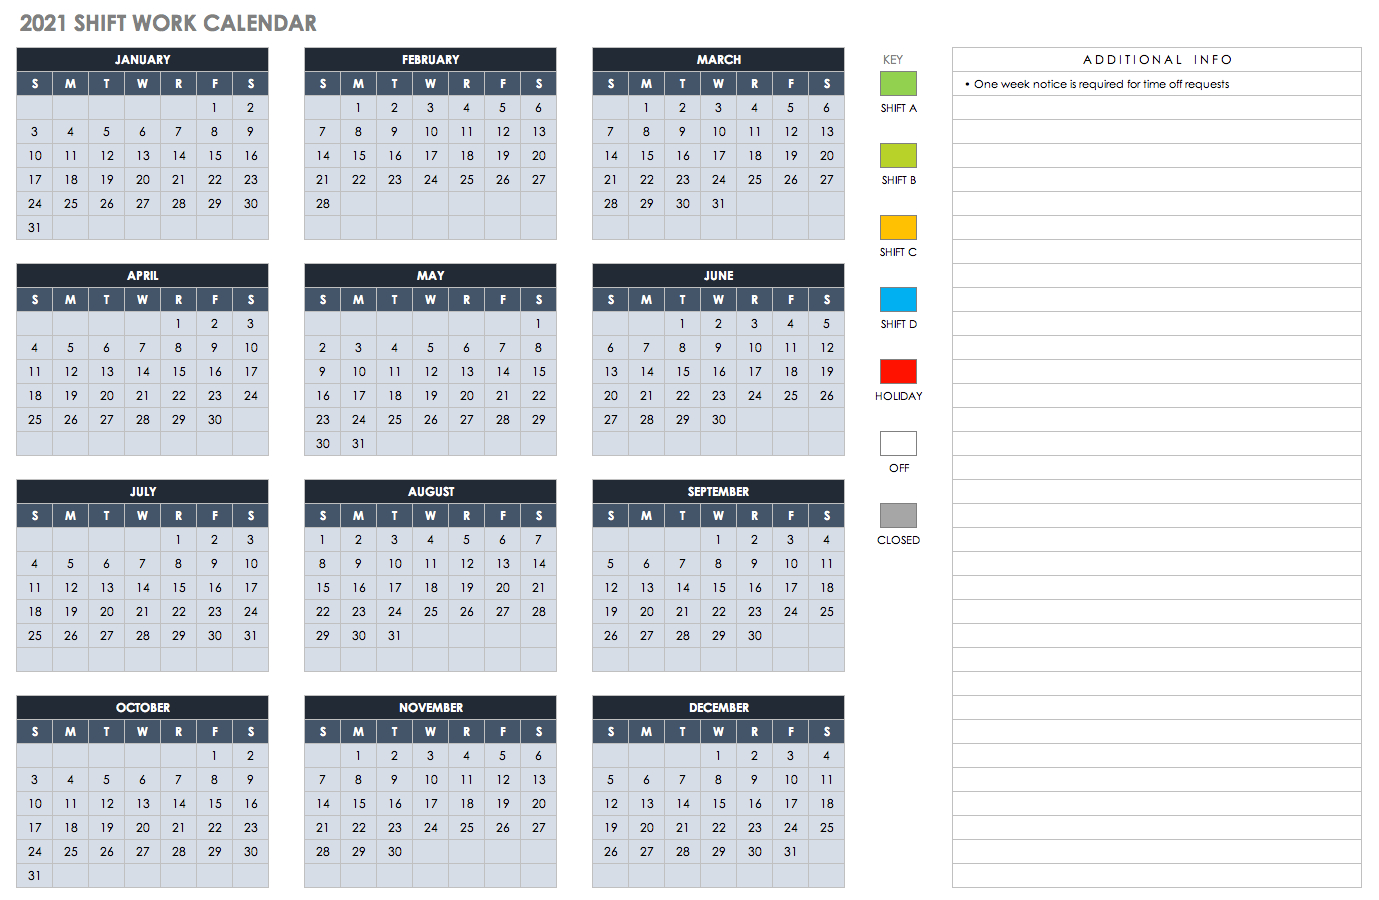 Free Blank Calendar Templates - Smartsheet for Jfrd 2022 Shift Calendar